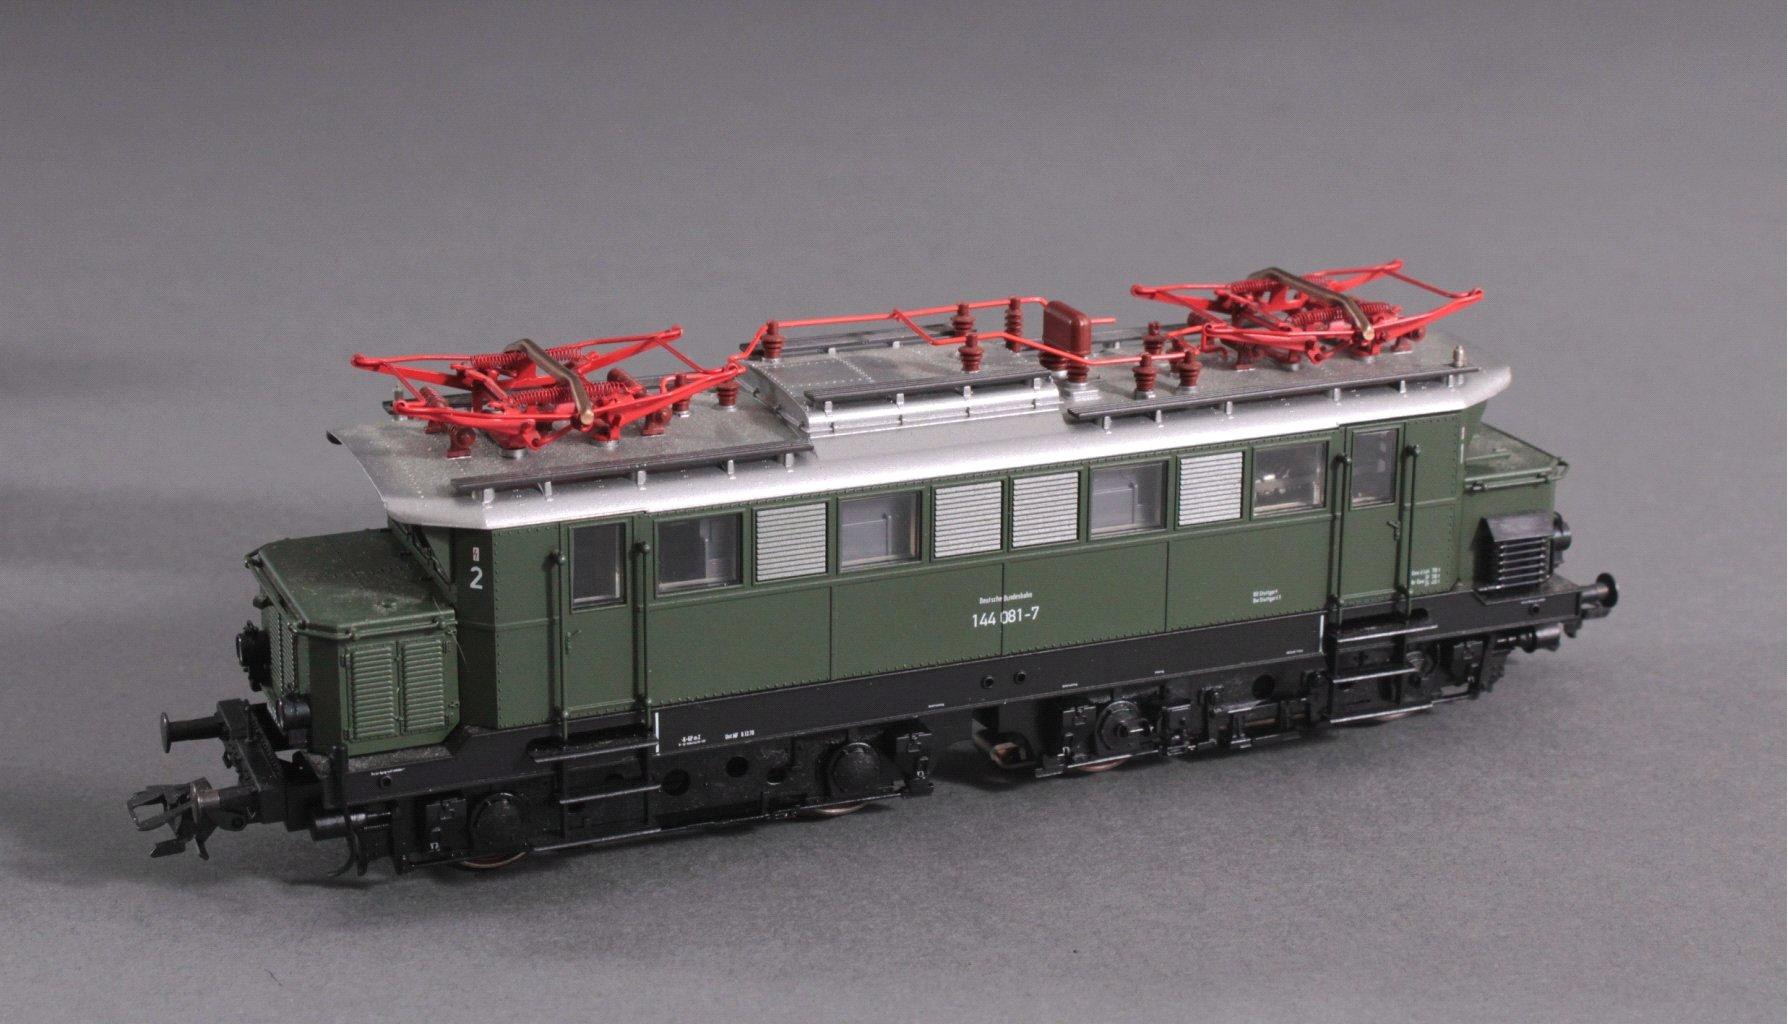 Fleischmann H0 144 081-7 E-Lok in grün-1